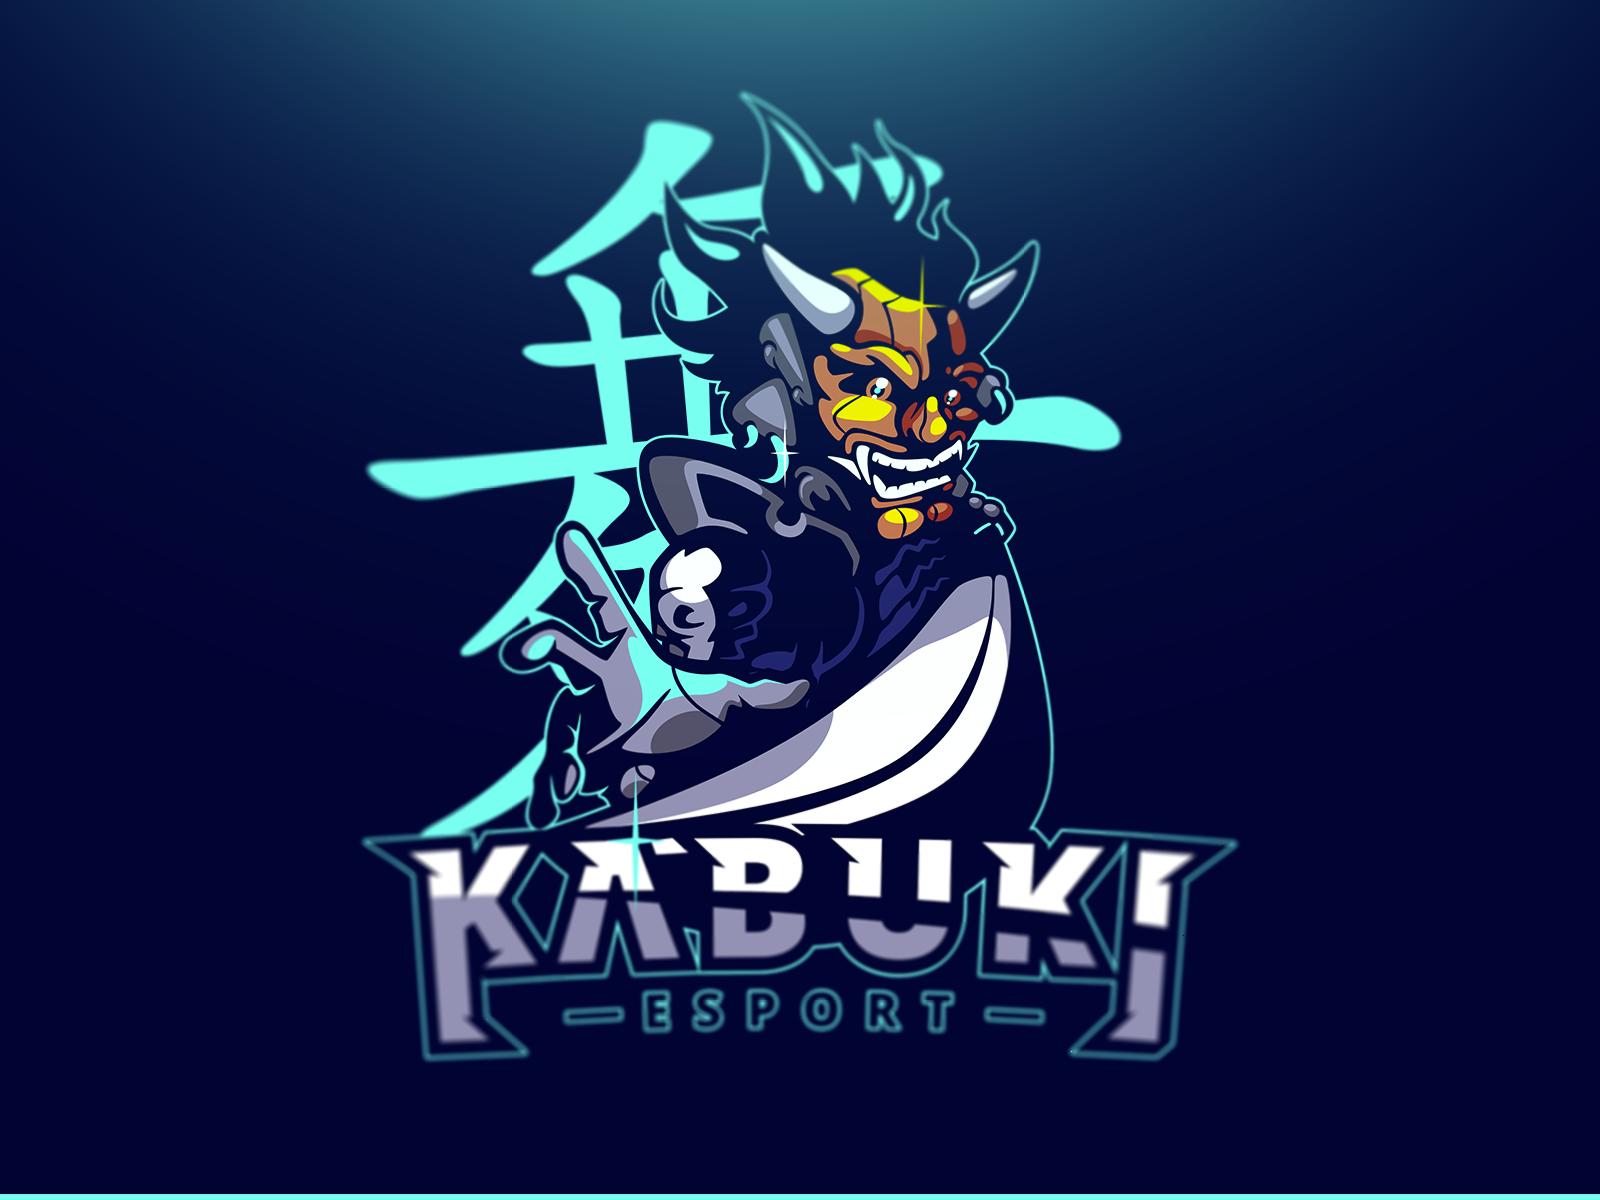 kabuki sport ninja logo character